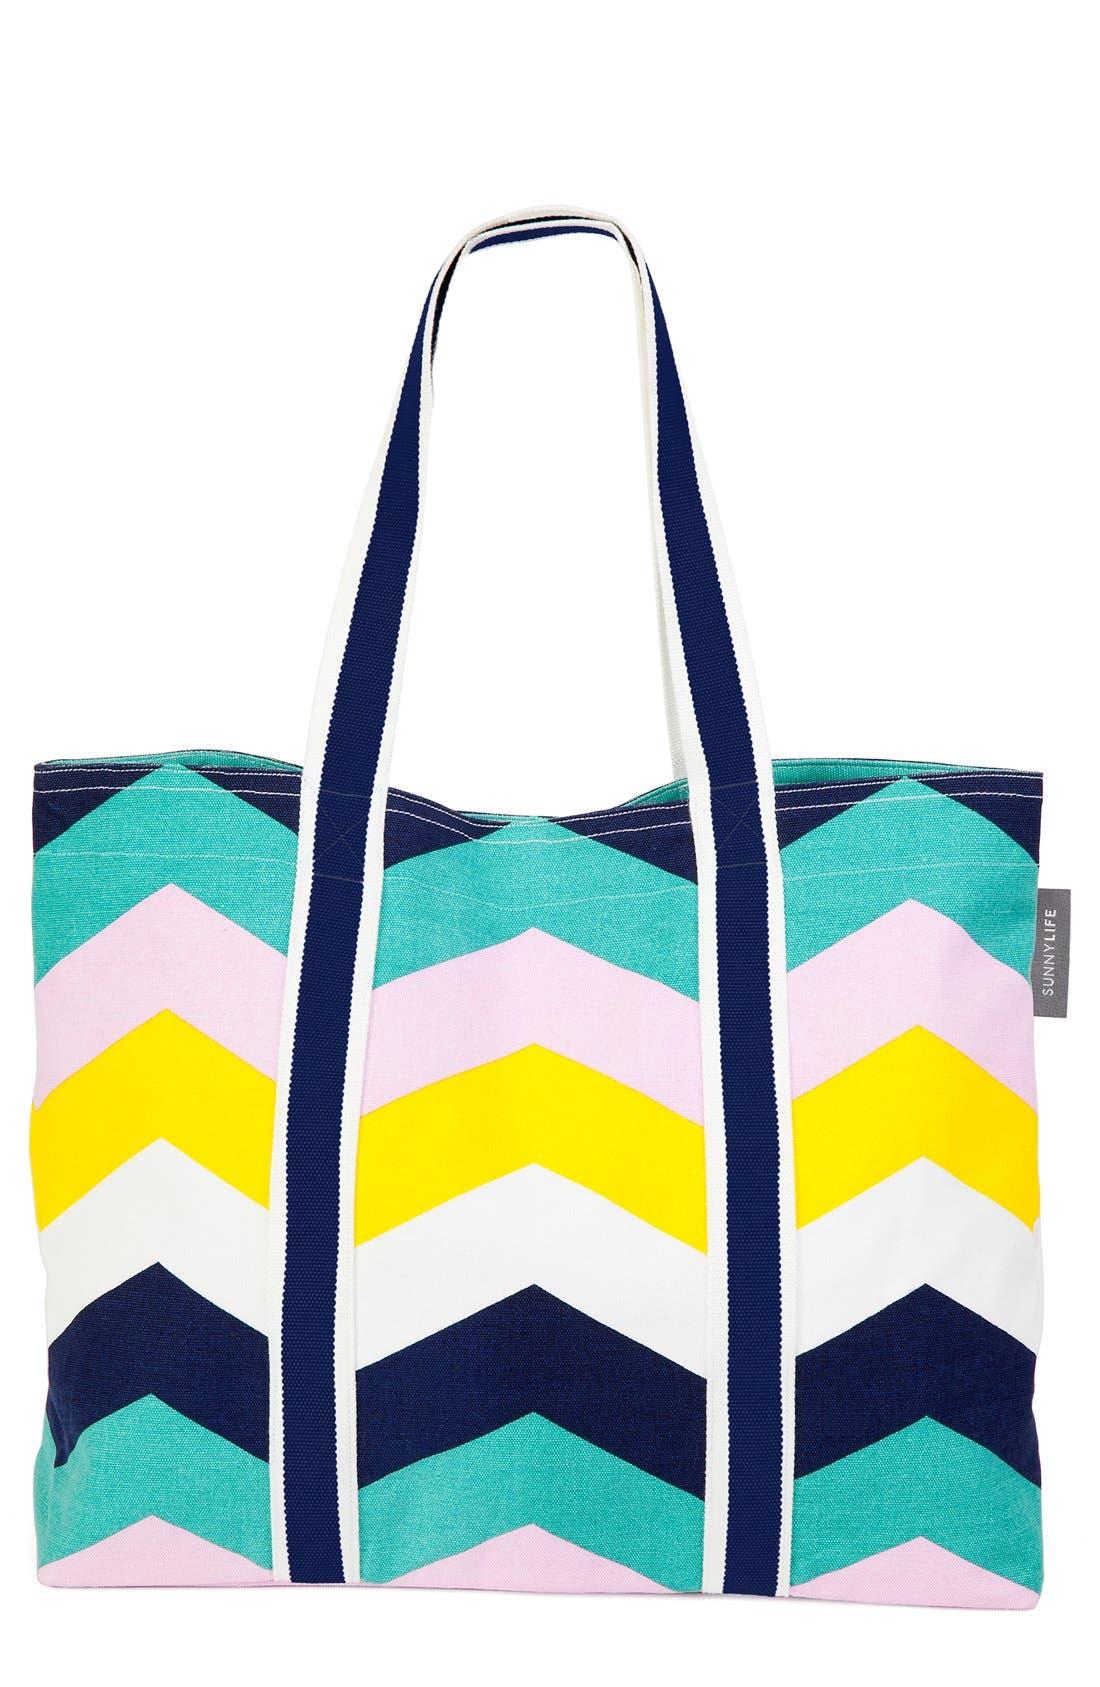 Main Image - Sunnylife 'Acapulco' Tote Bag